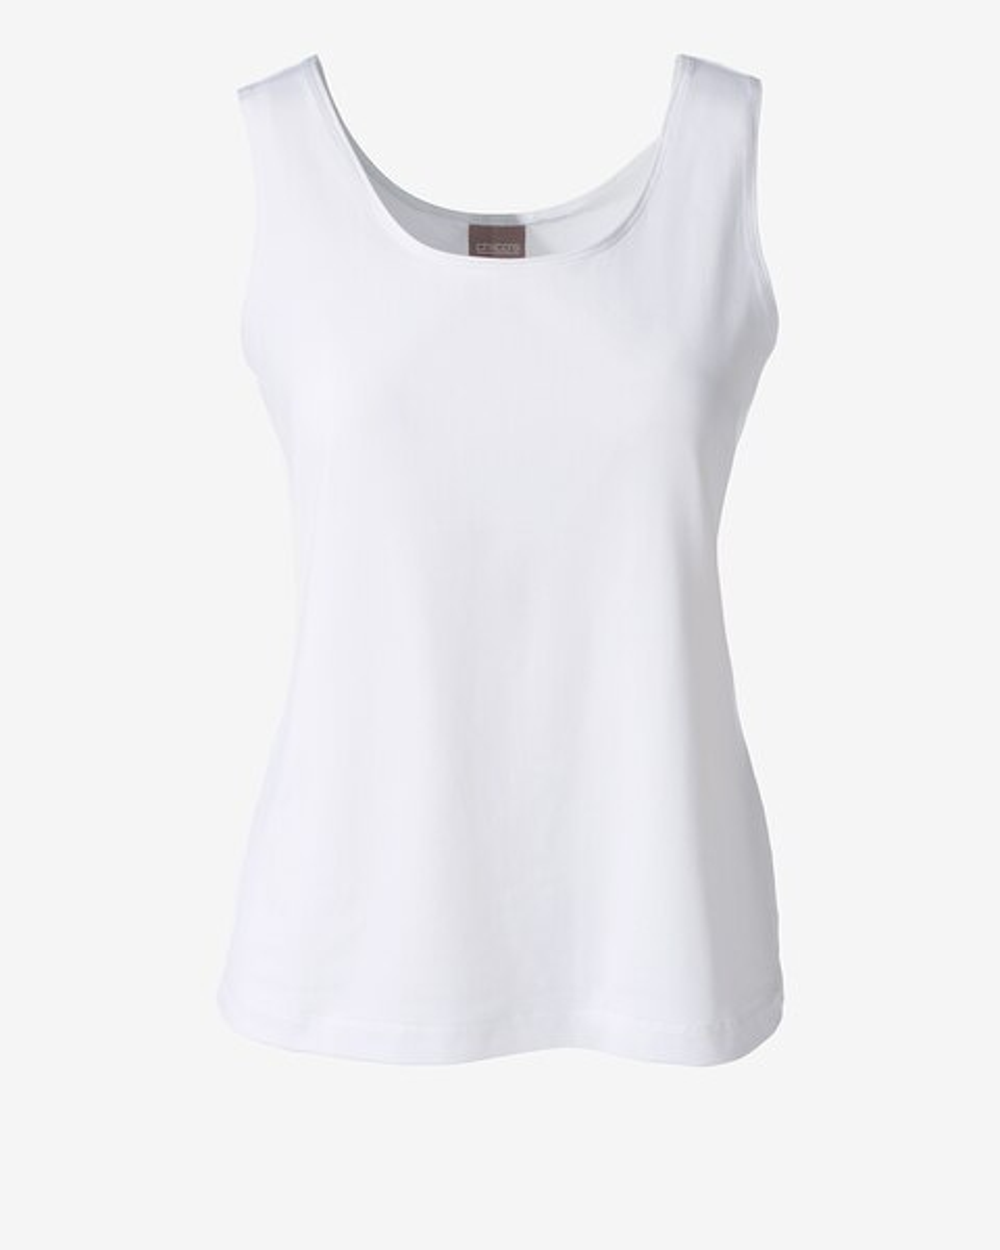 6f07da7980fbeb Microfeel Timeless Scoop-Neck Tank - Women's Tops - Women's Clothing ...